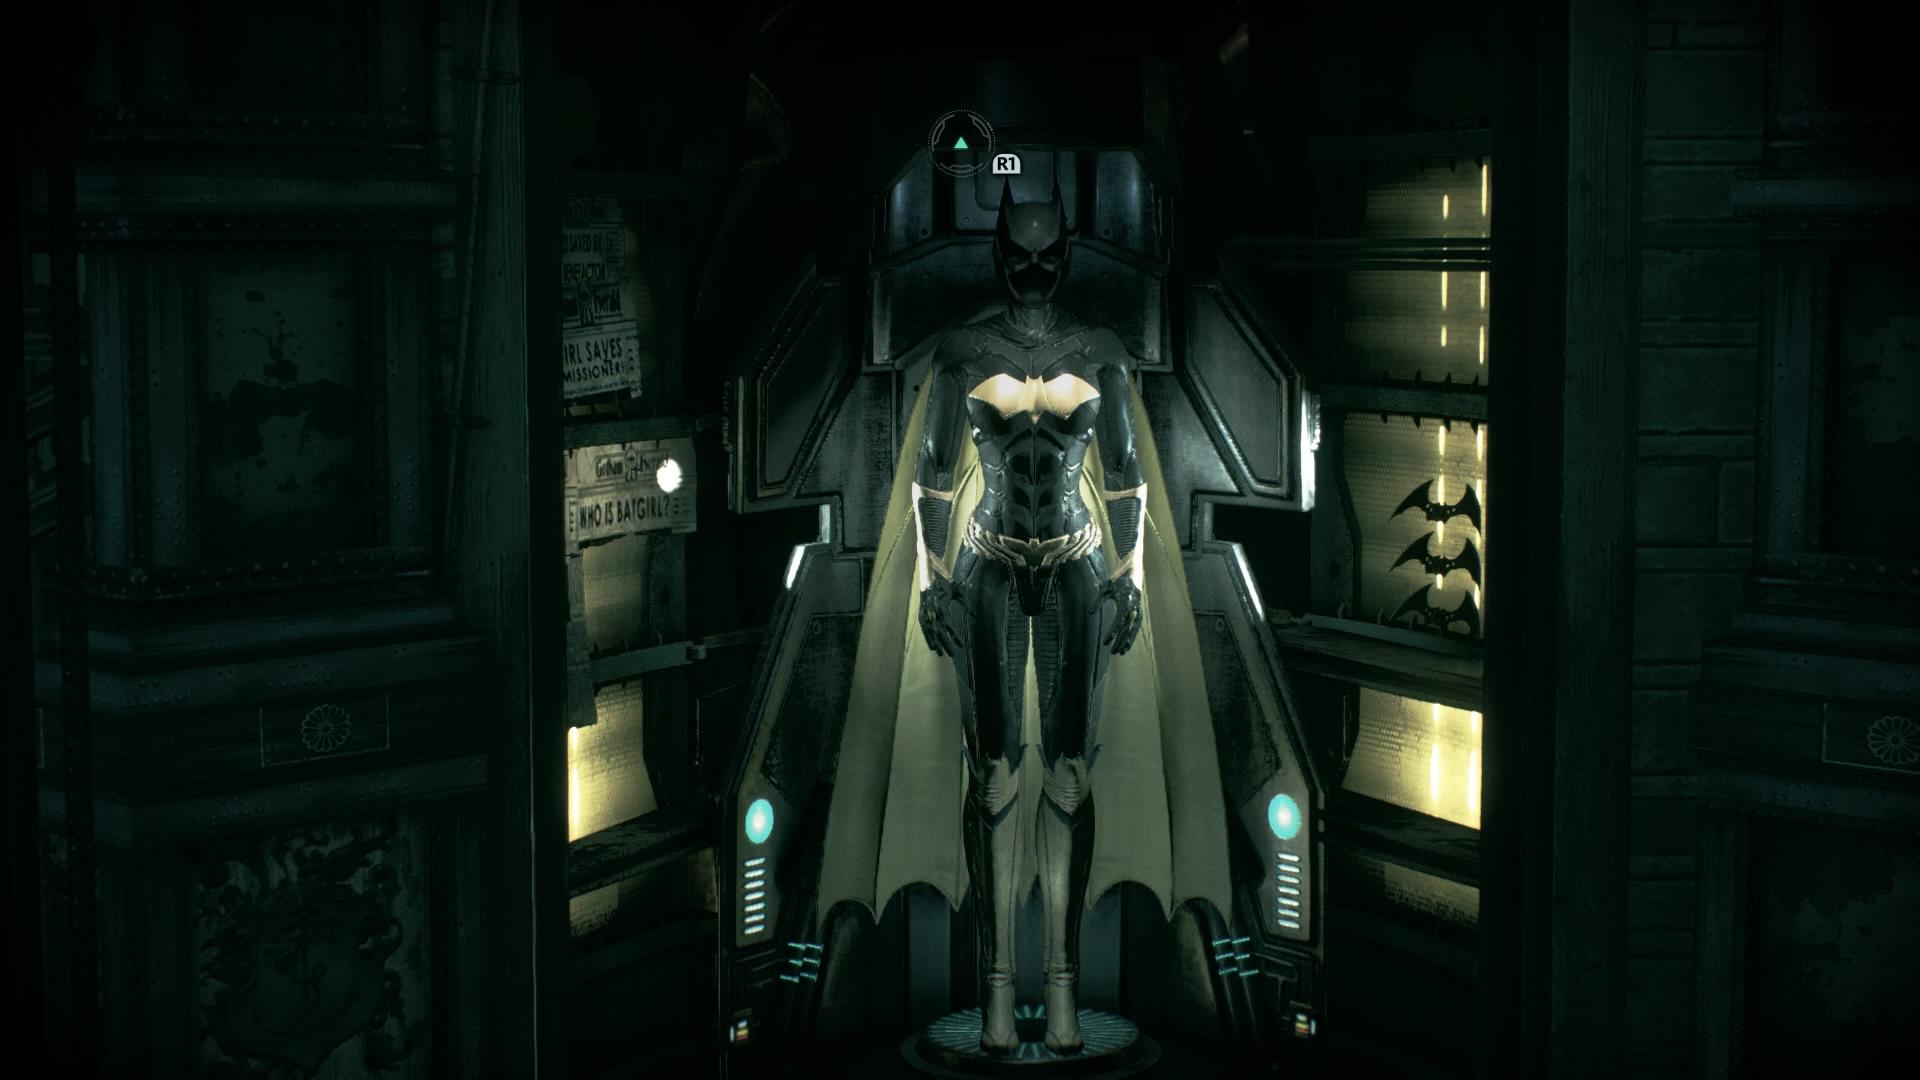 Recenze: Batman Arkham Knight – Strach nad Gothamem 10715